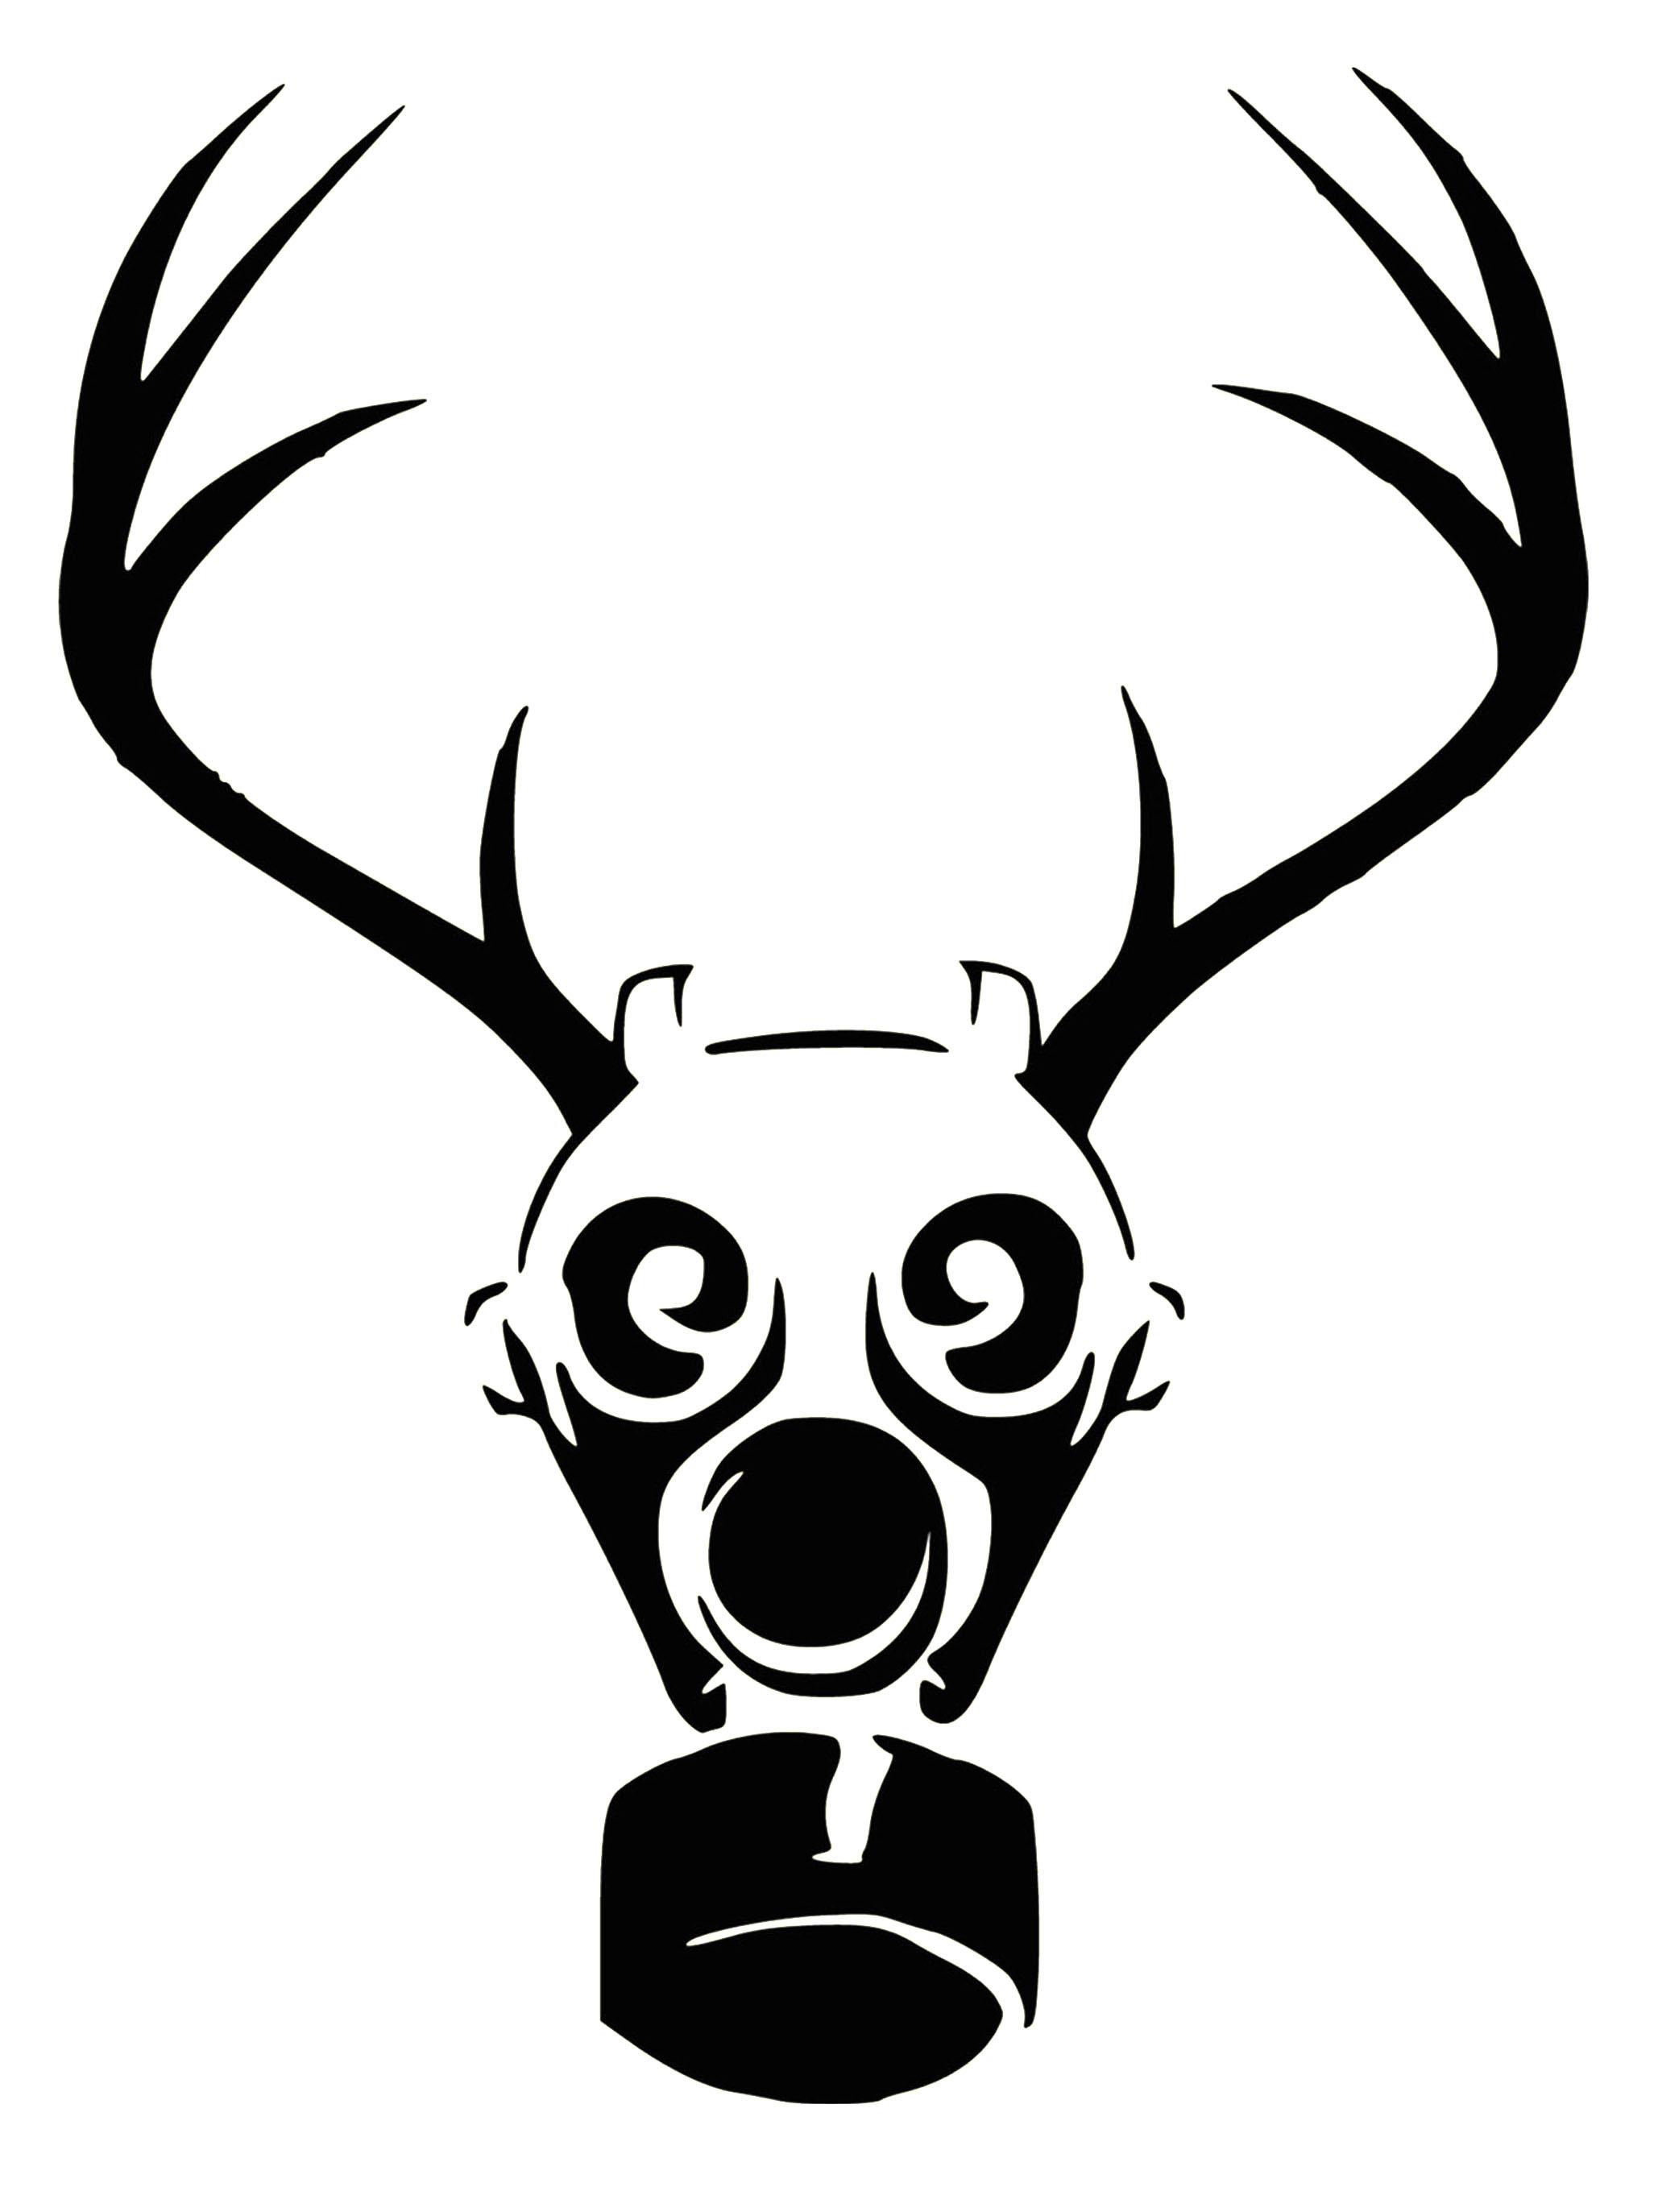 adornato_logo